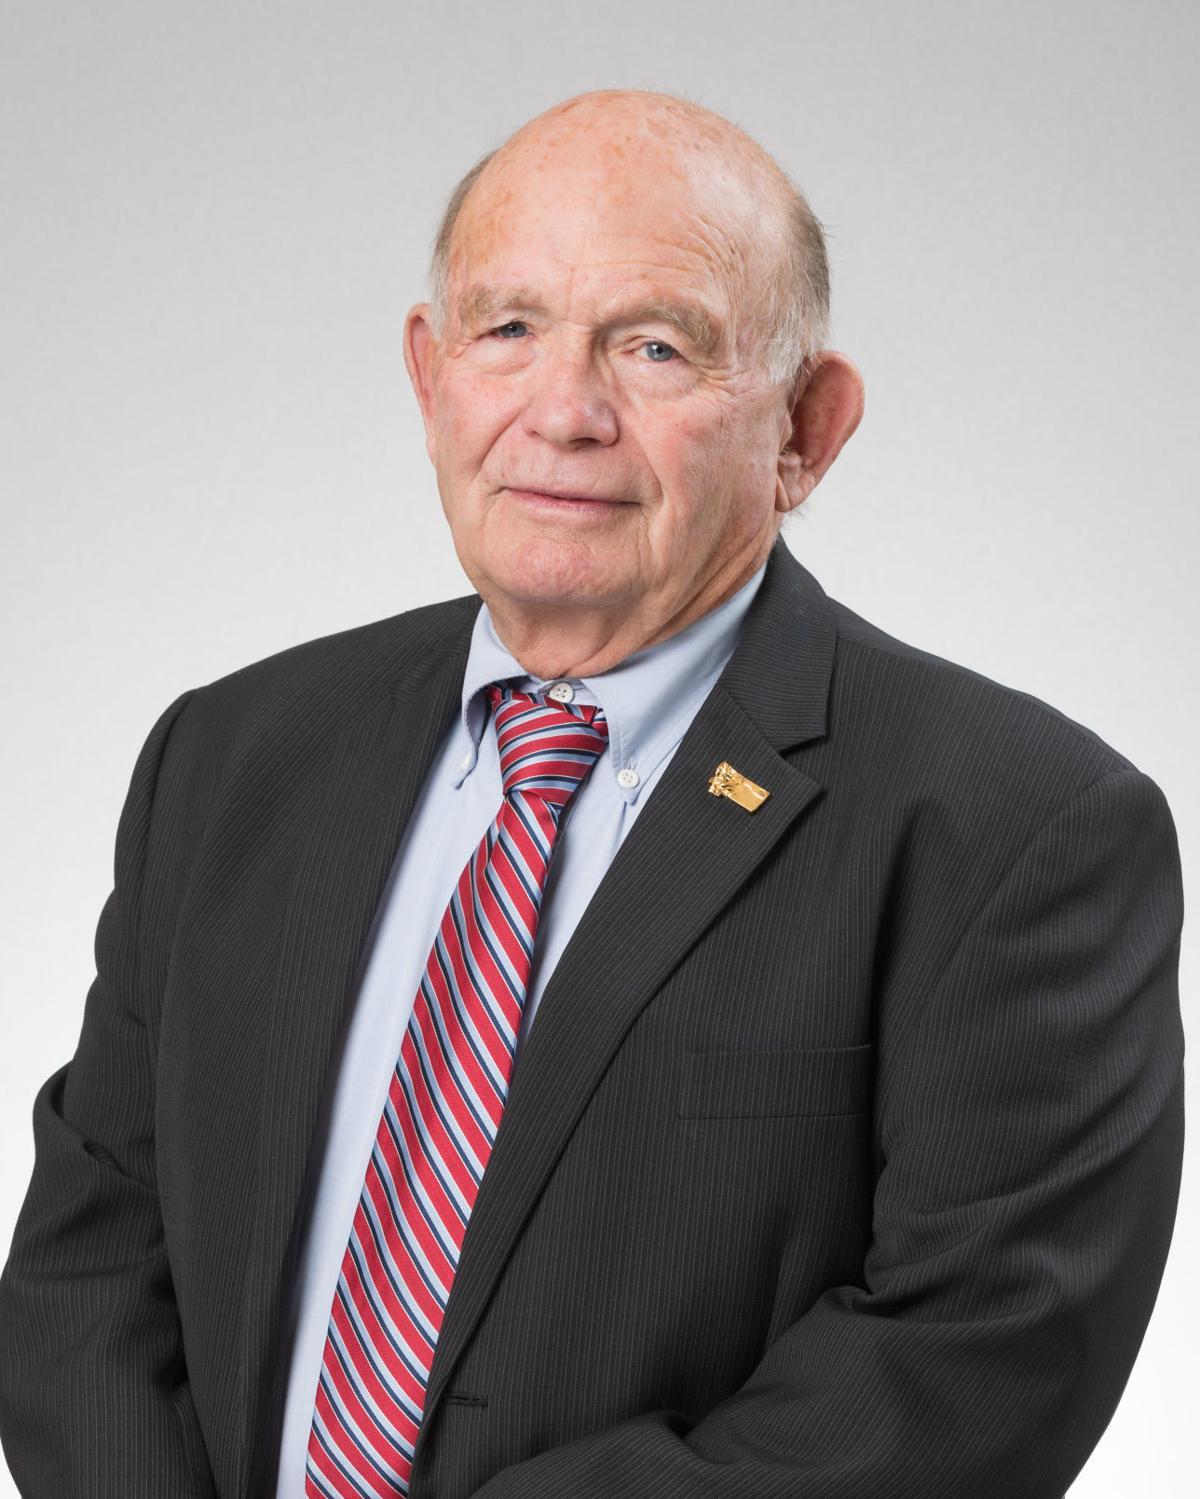 Rep. Jim Keane mugshot